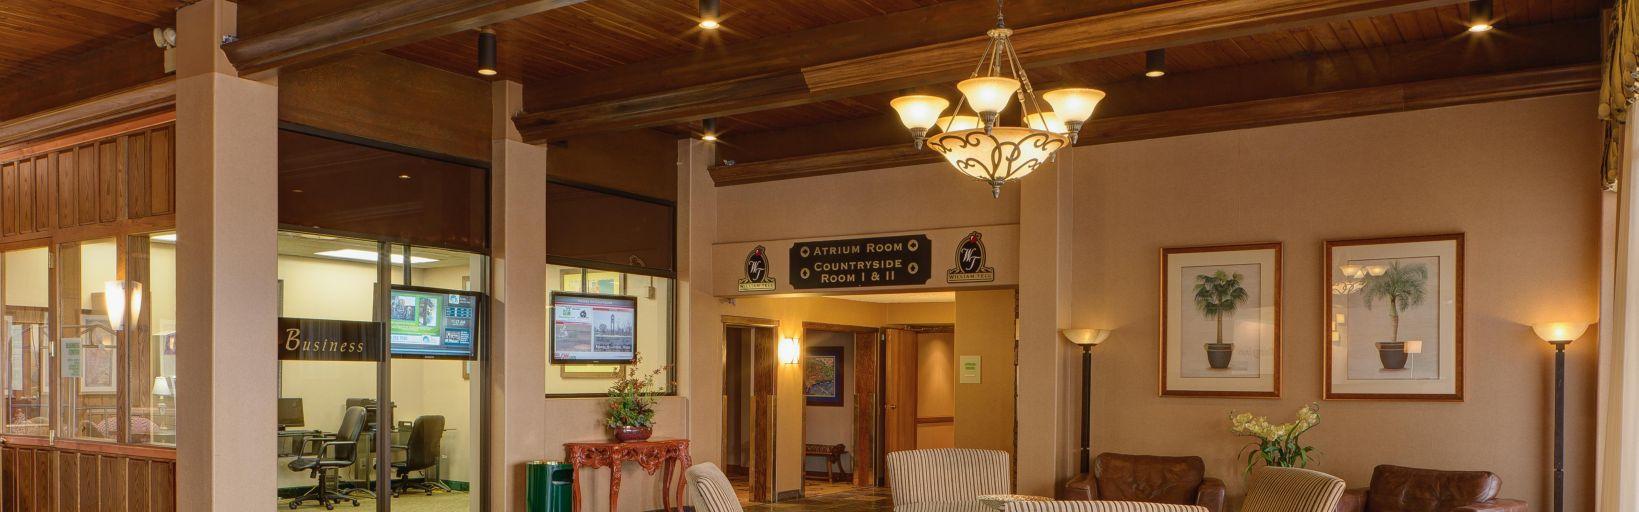 Countryside Hotel Exterior Lobby